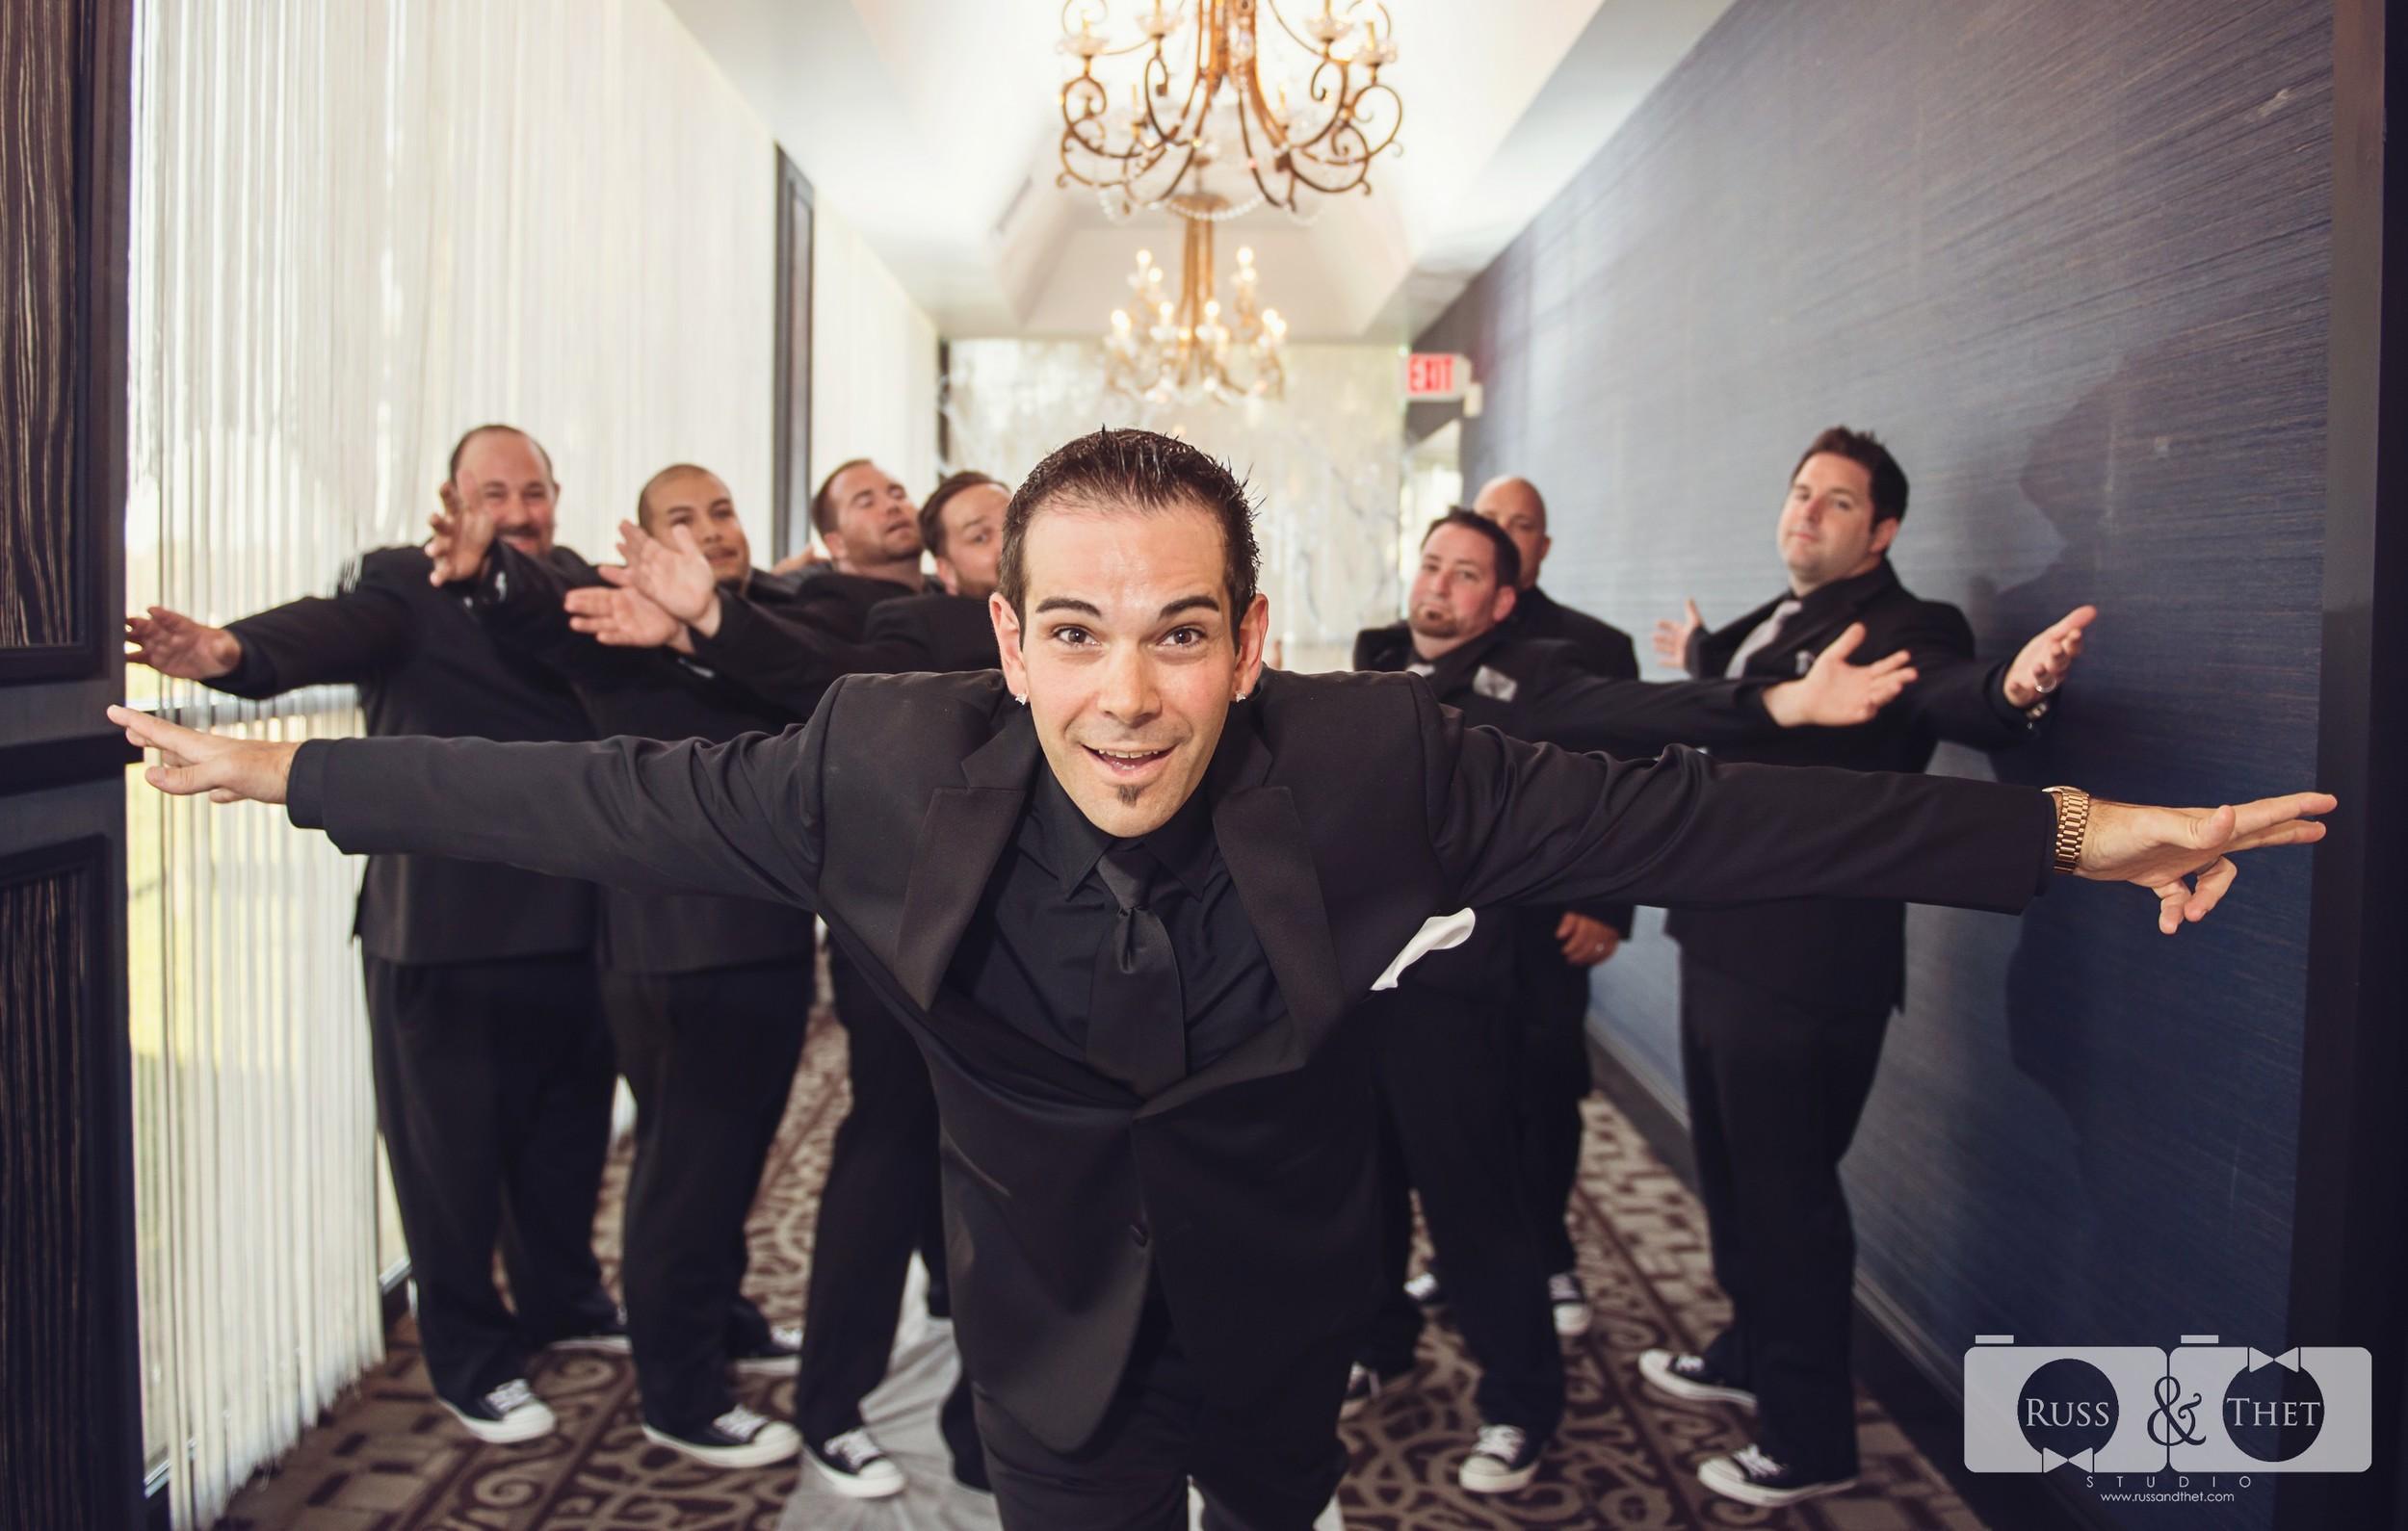 Jon&Kimee-The-Hills-Hotel-Wedding-Photographer (59).jpg